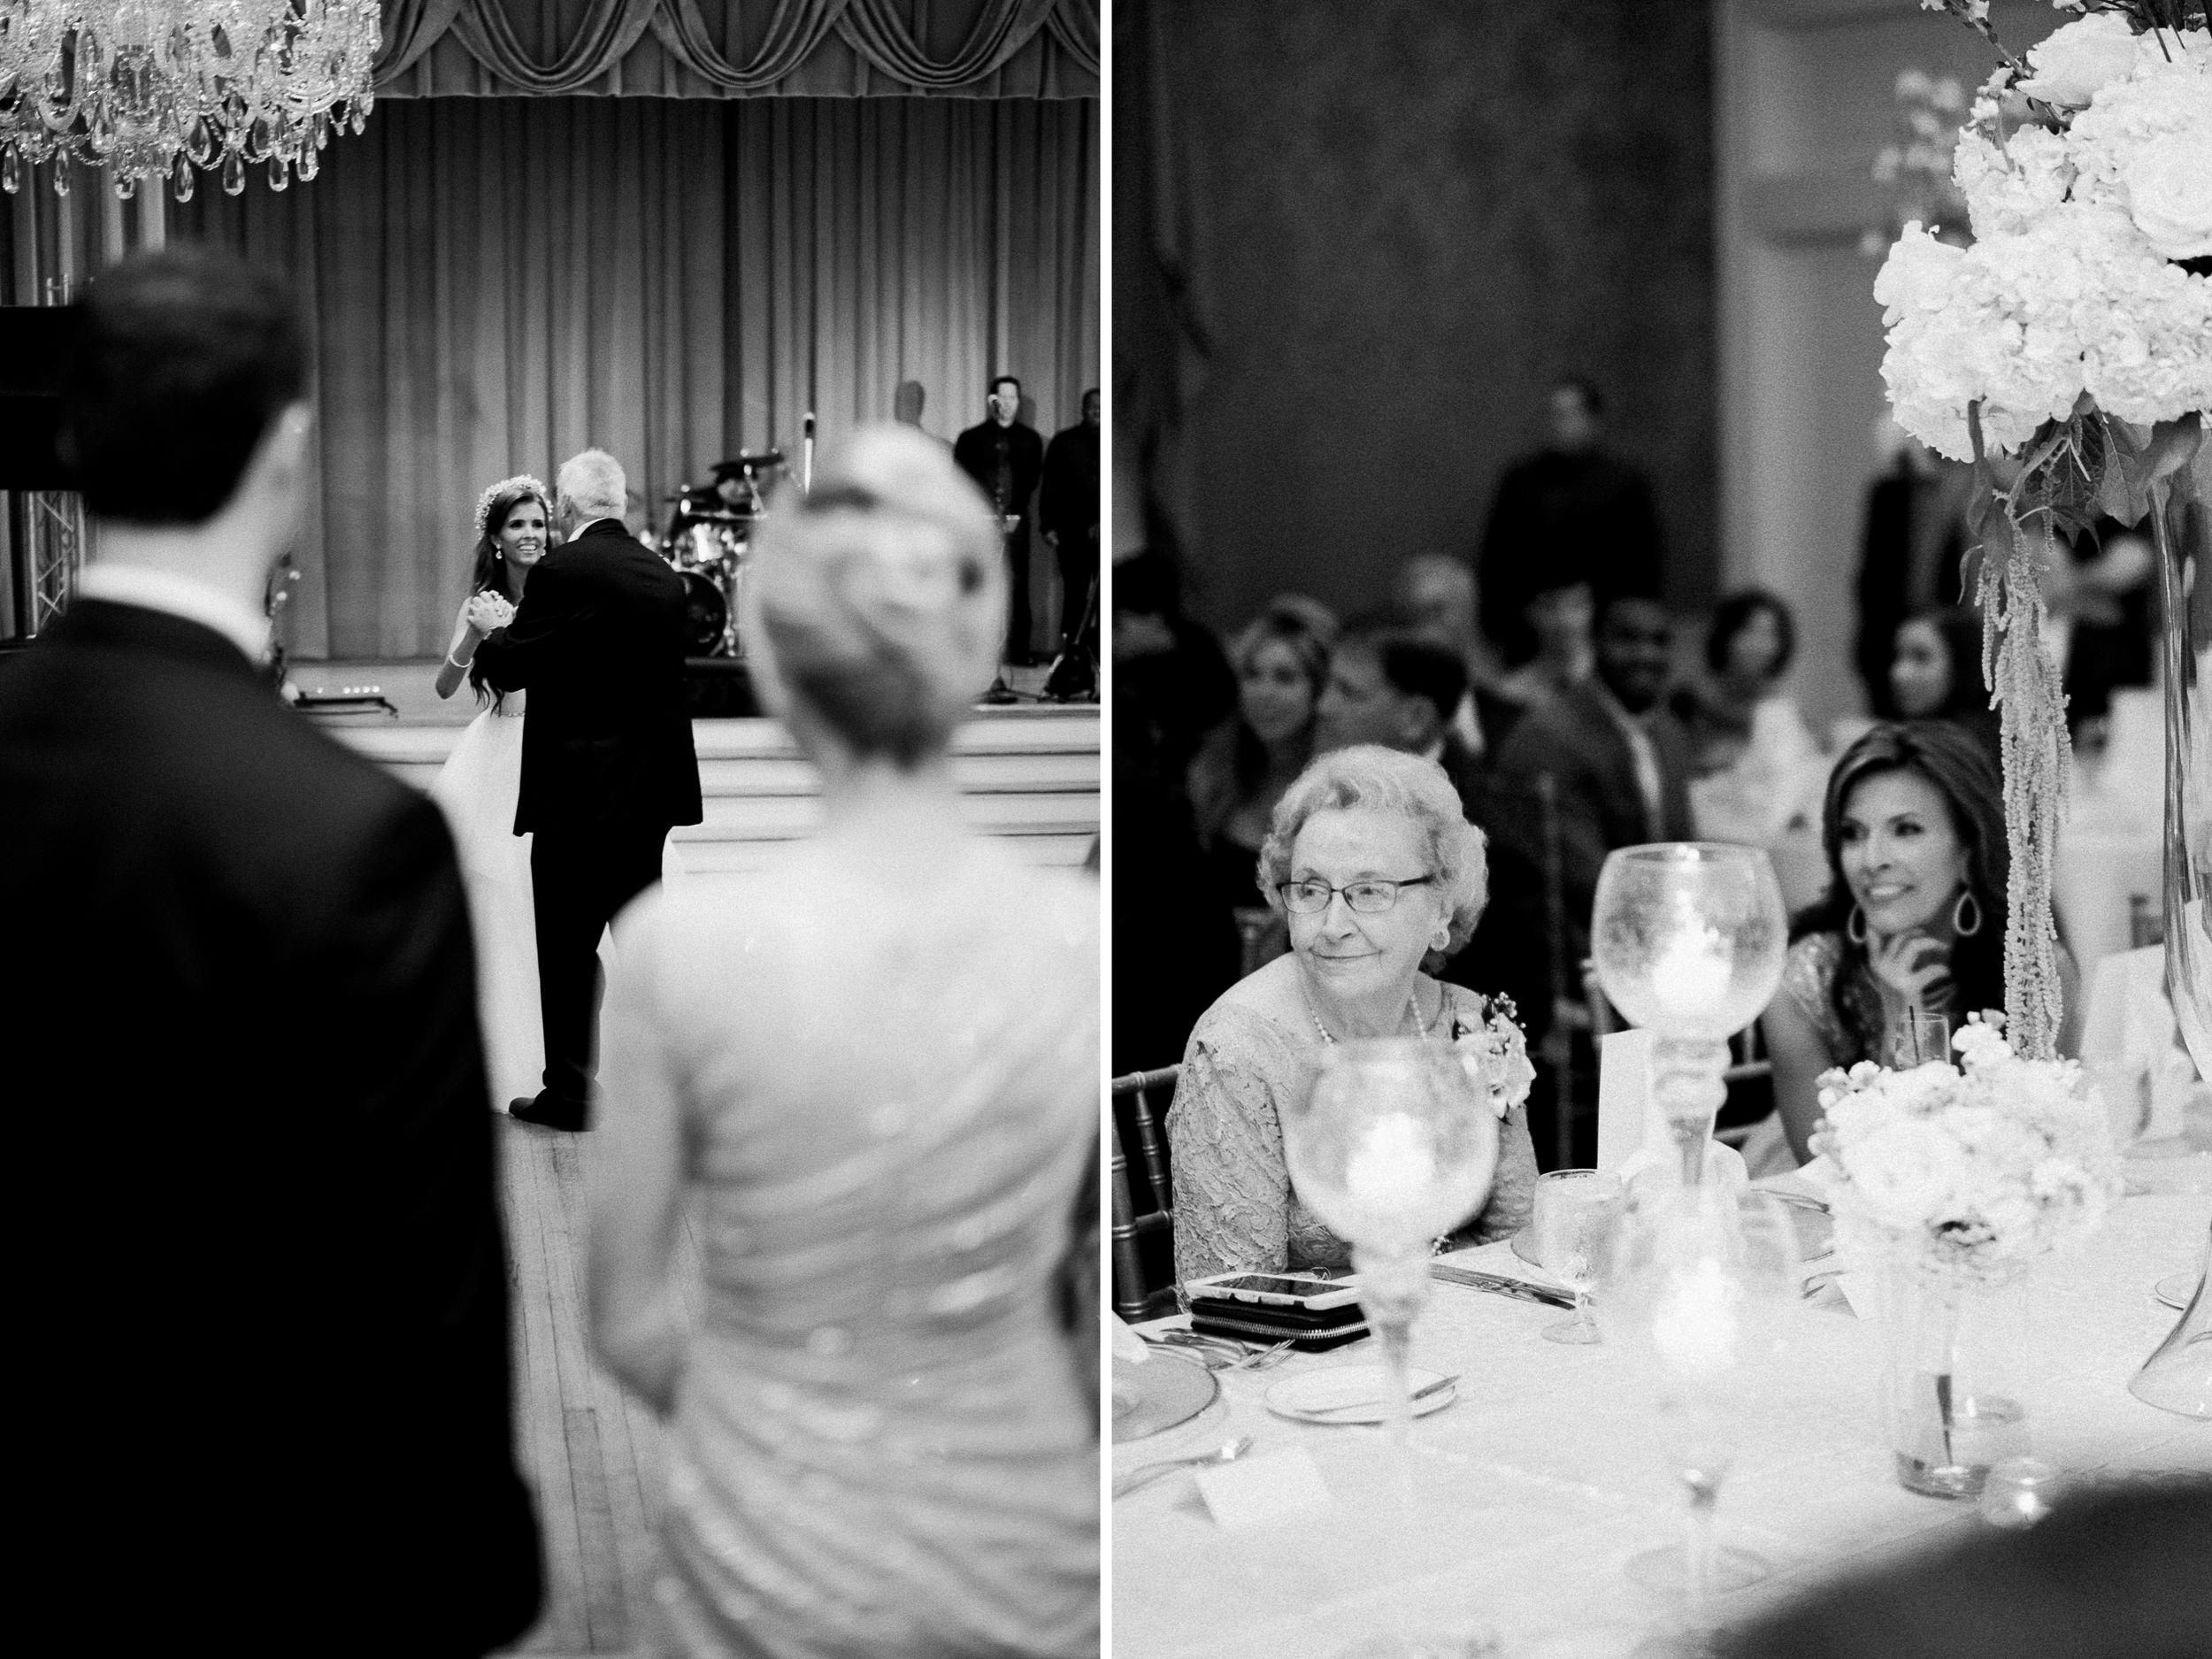 Dana-Fernandez-Photography-Weddings-in-Houston-Magazine-feature-Houston-wedding-photographer-film-161.jpg